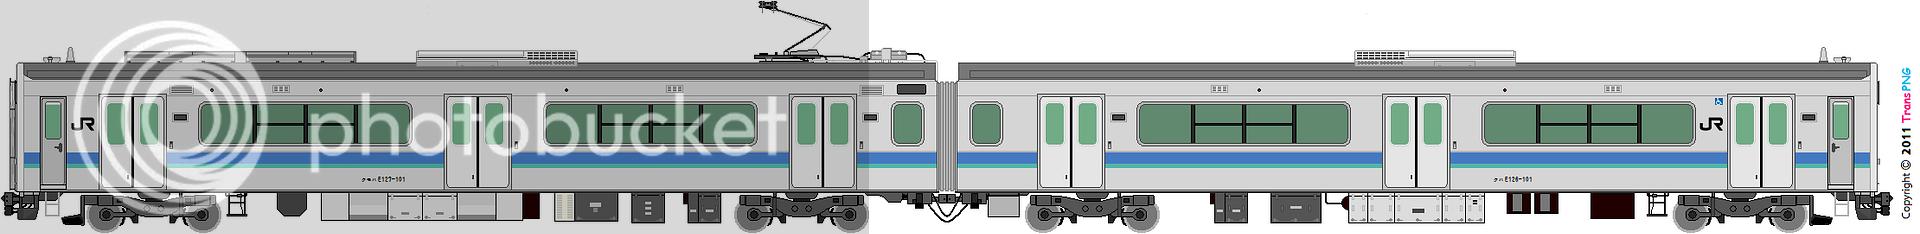 Train 2270